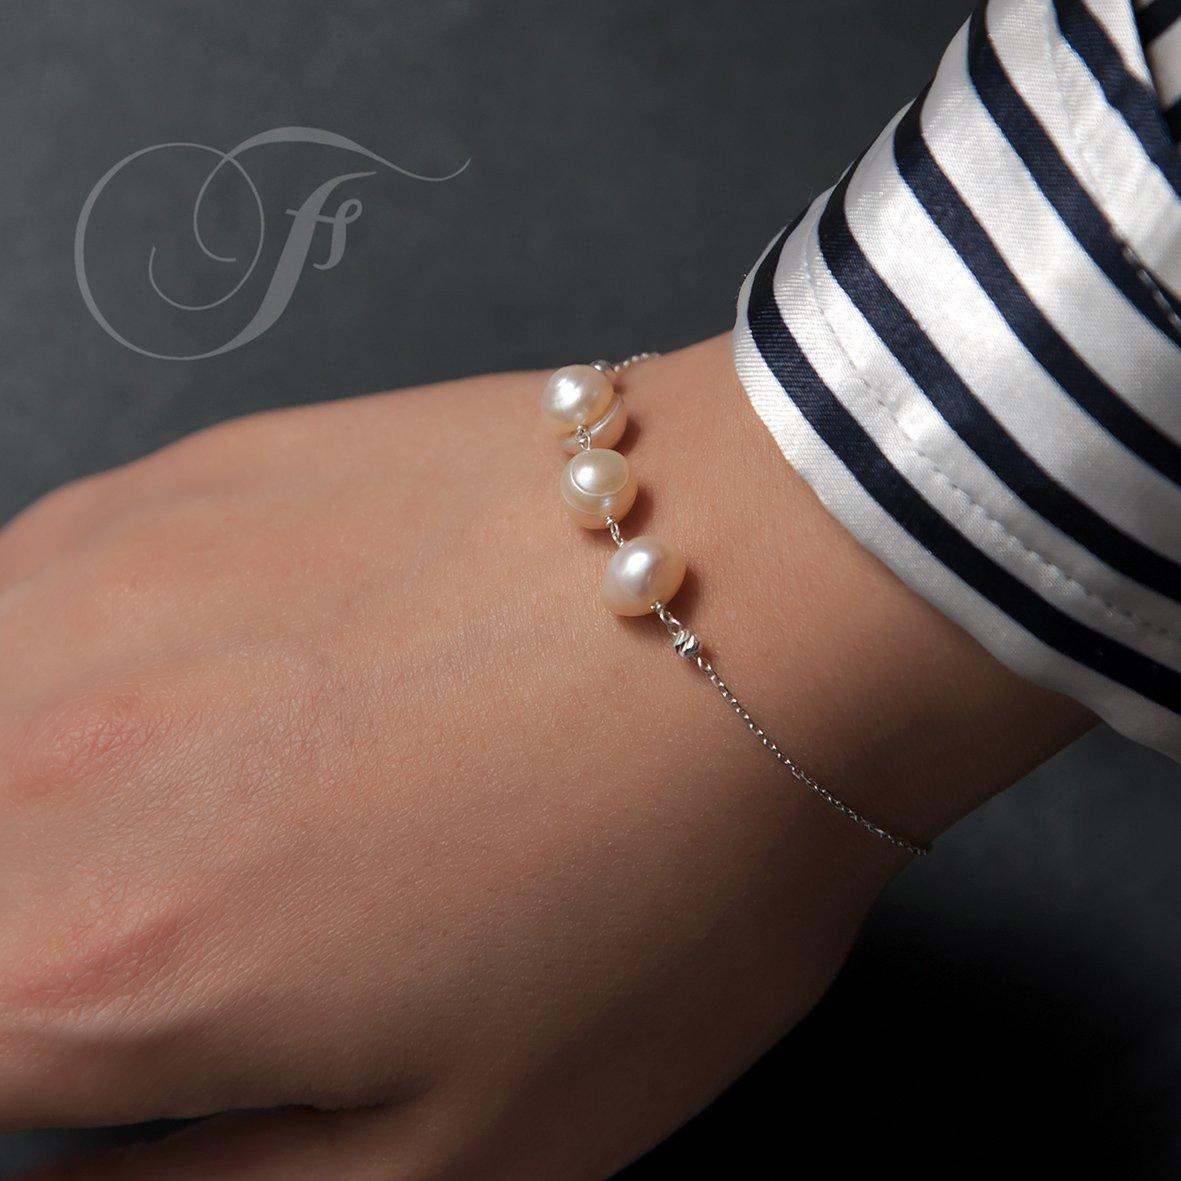 دستبند نقره طرح خيال